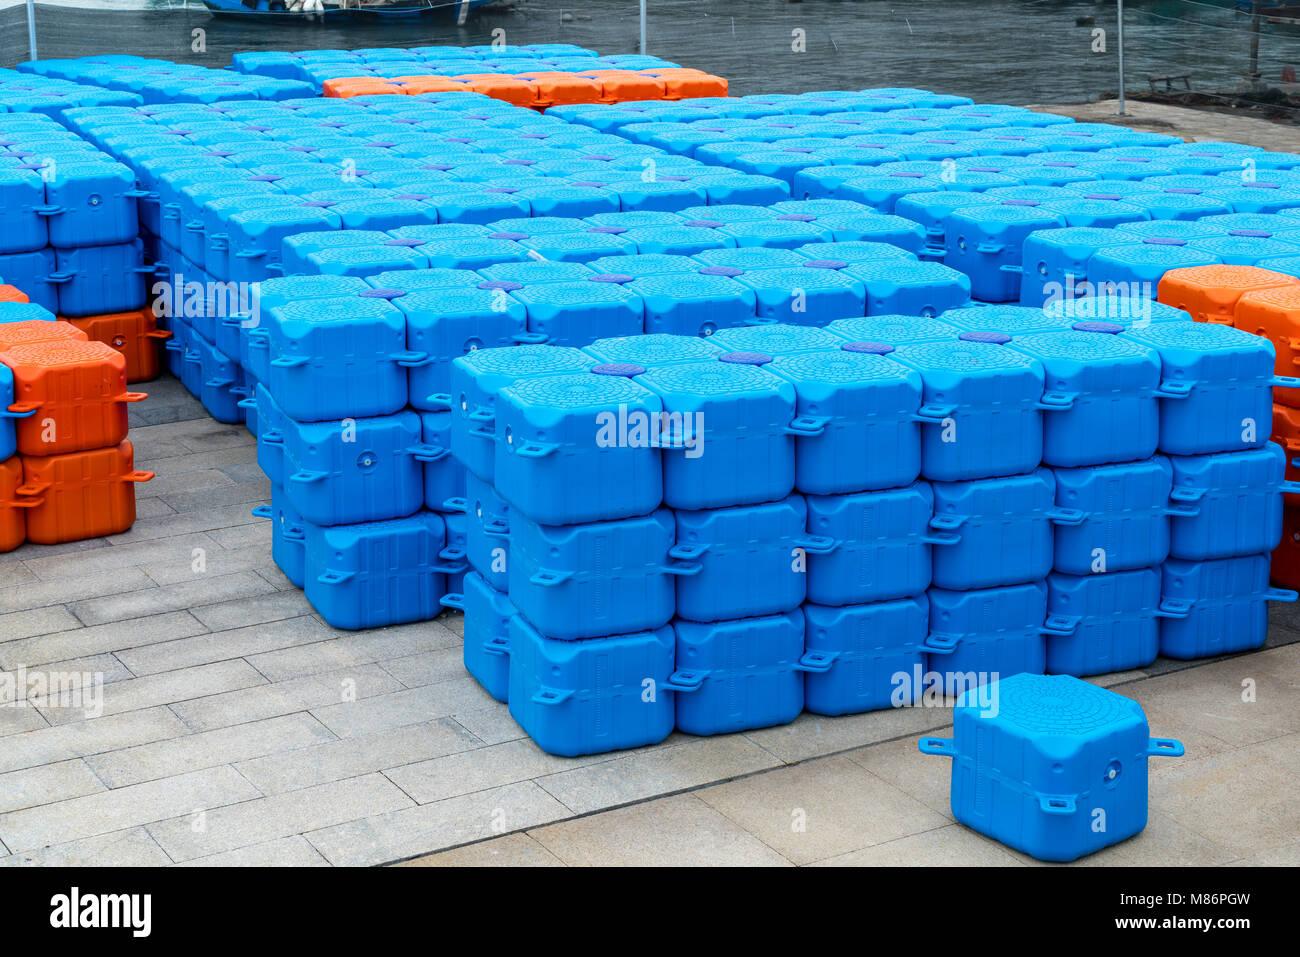 The plastic warehousing logistics box on the seashore is